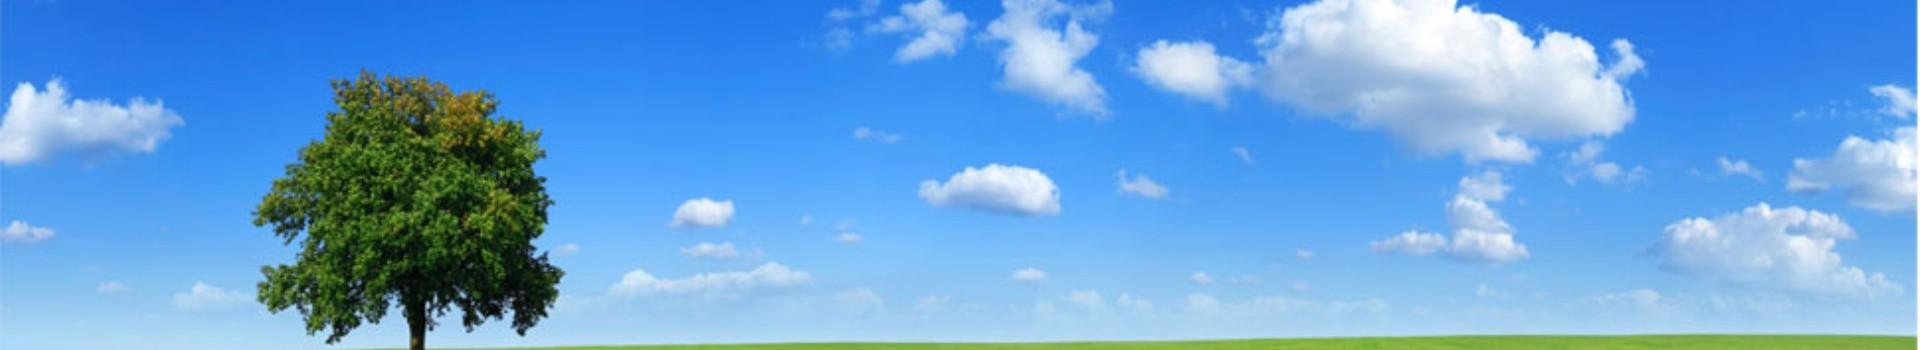 Green tree blue sky